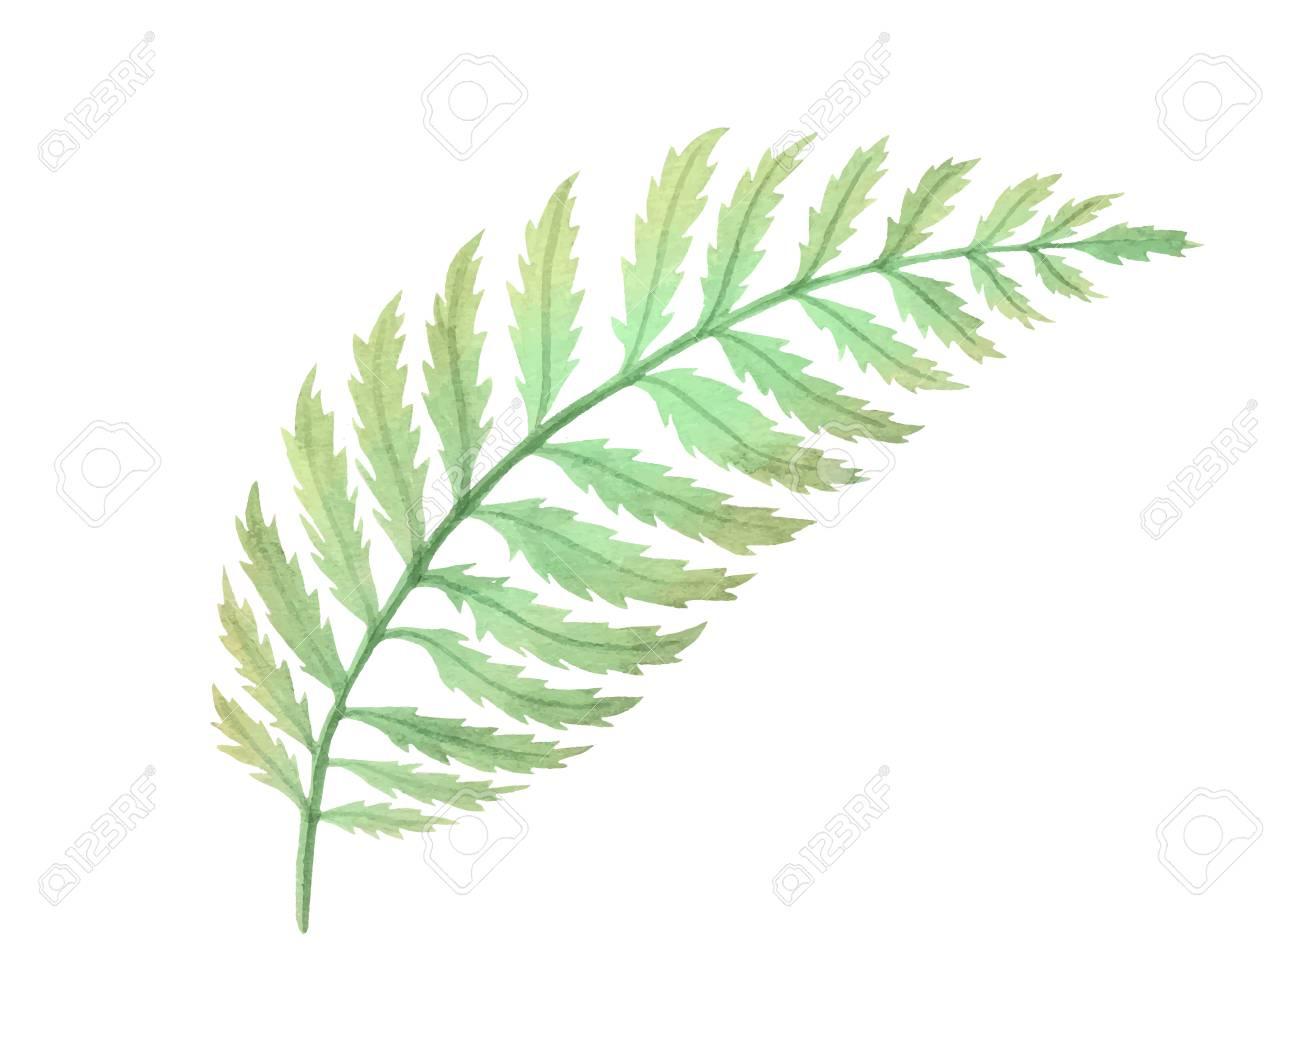 Bushes clipart fern. Free bush download clip